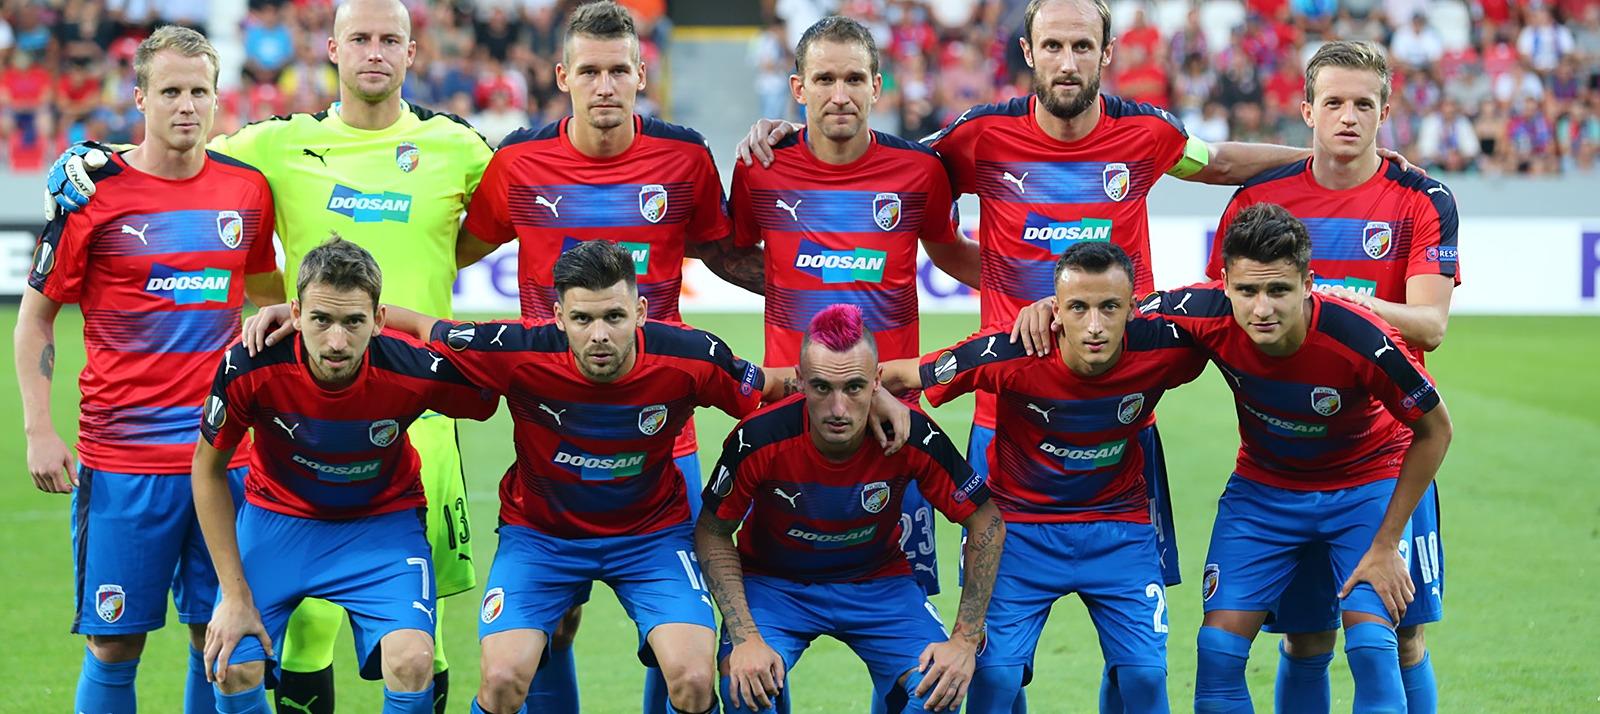 Plzeň - AS Roma